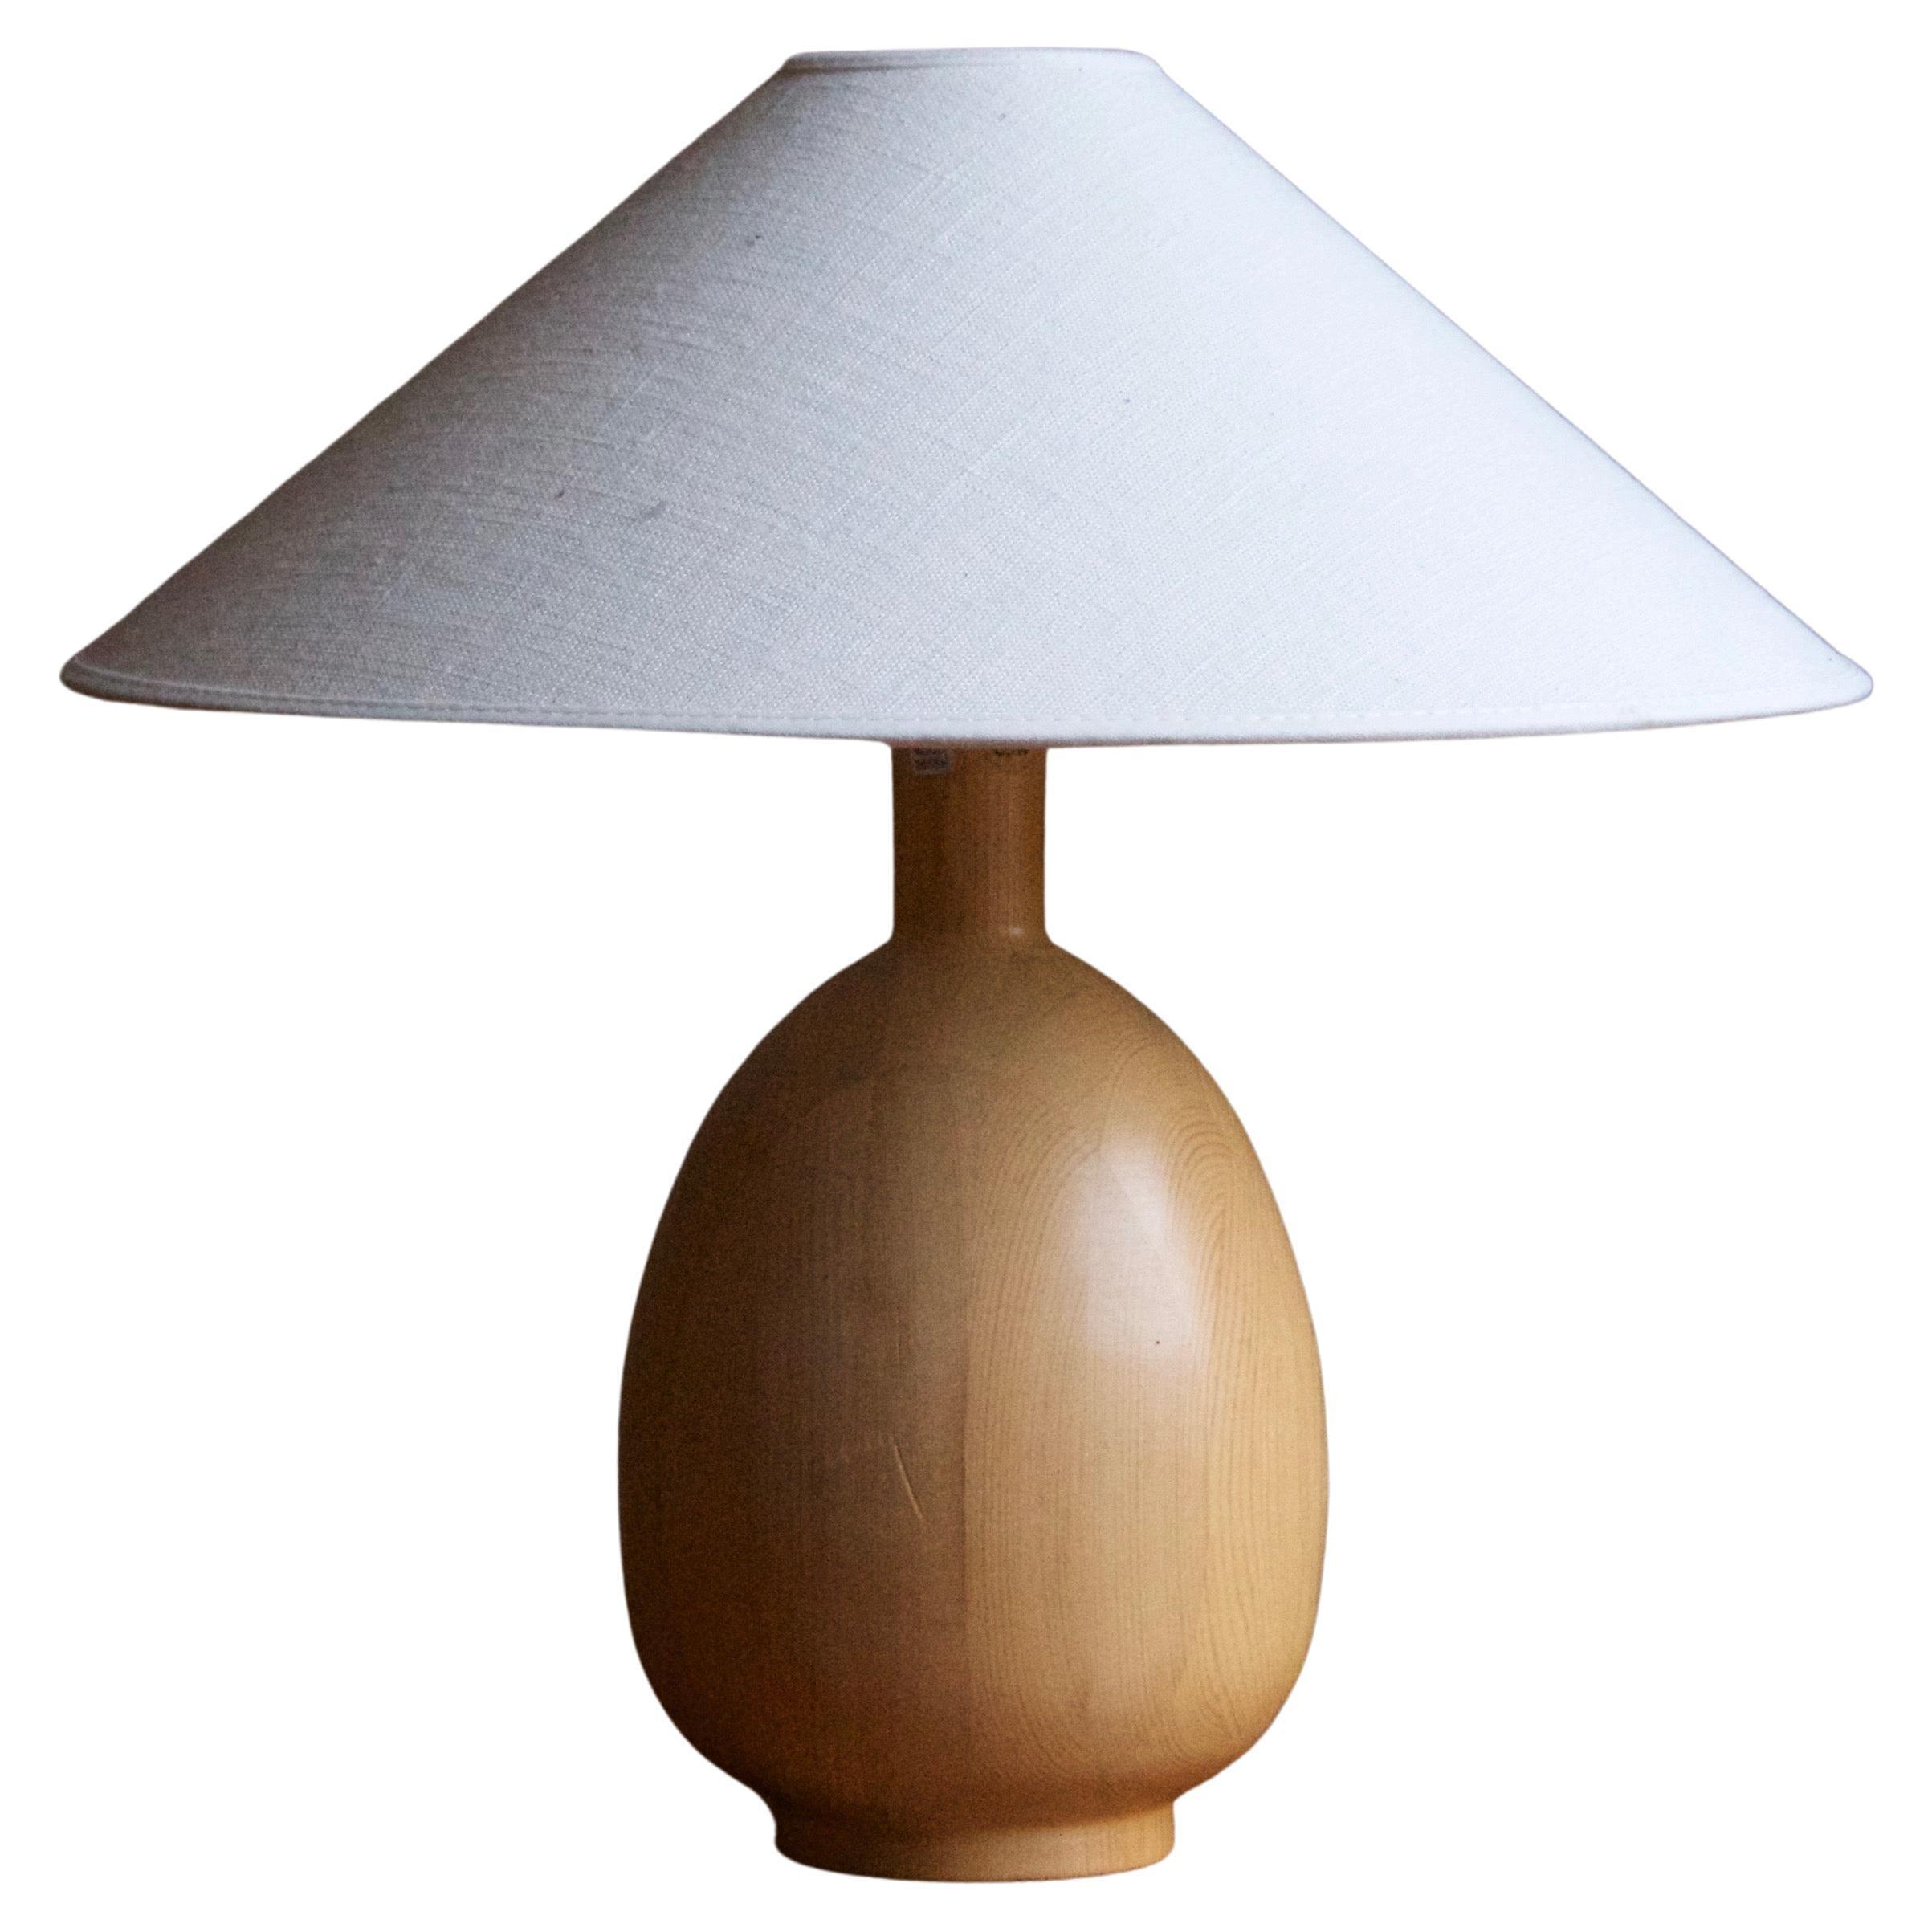 Markslöjd, Minimalist Table Lamp, Solid Pine, Kinna, Sweden, c. 1970s